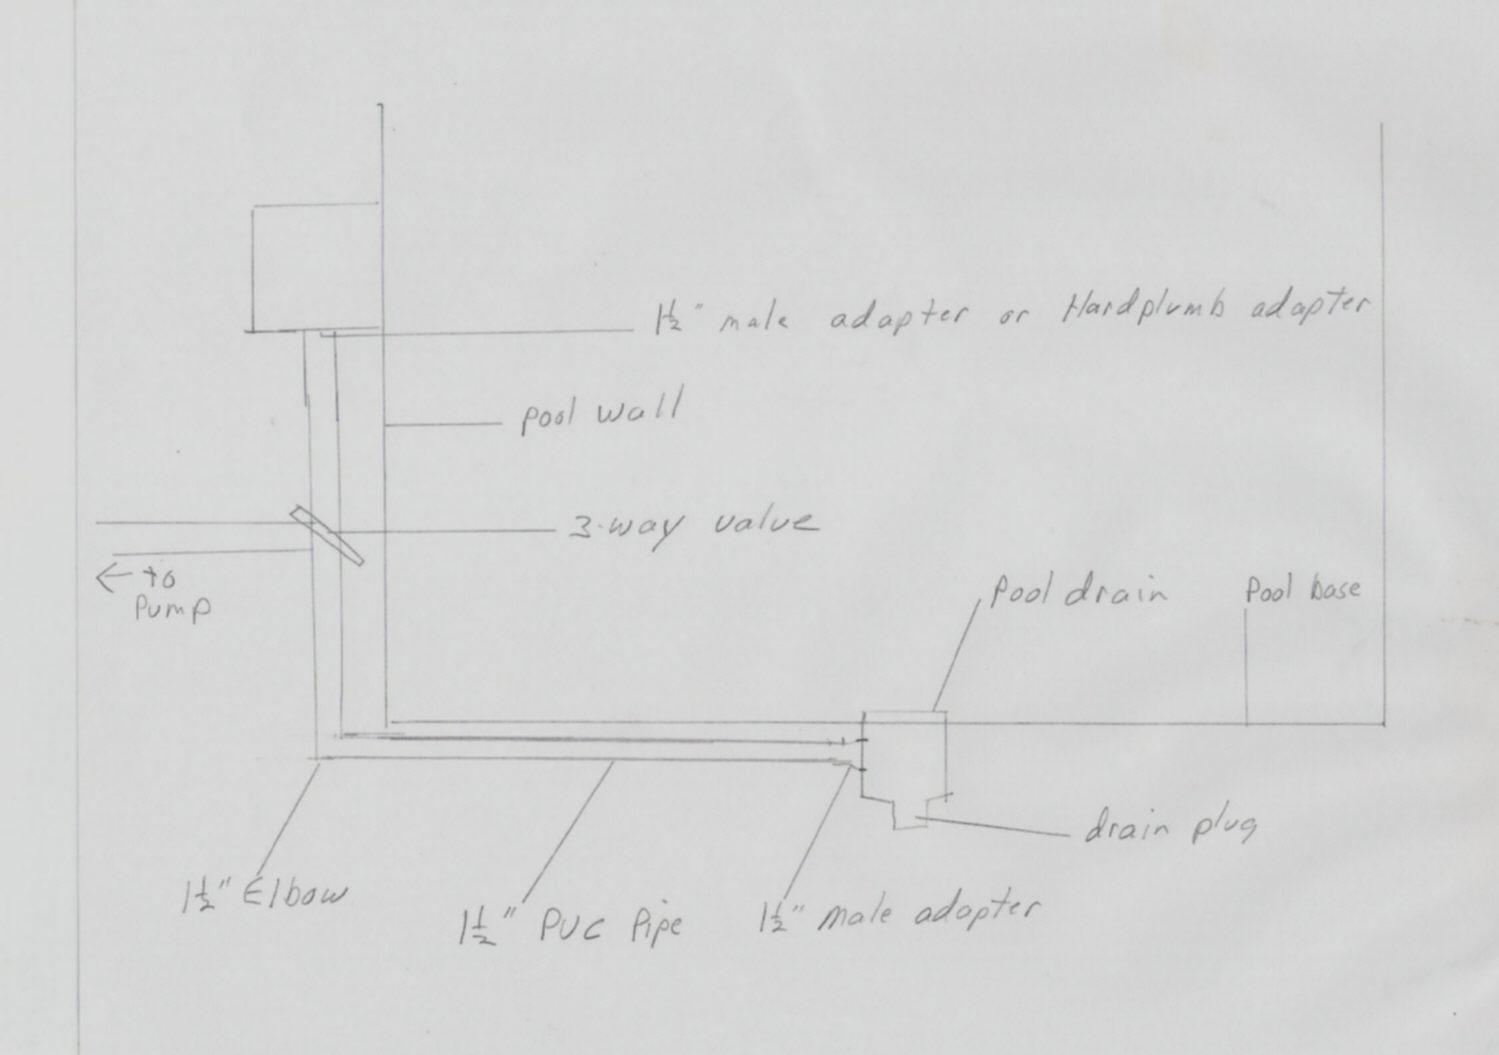 center drain plumbing